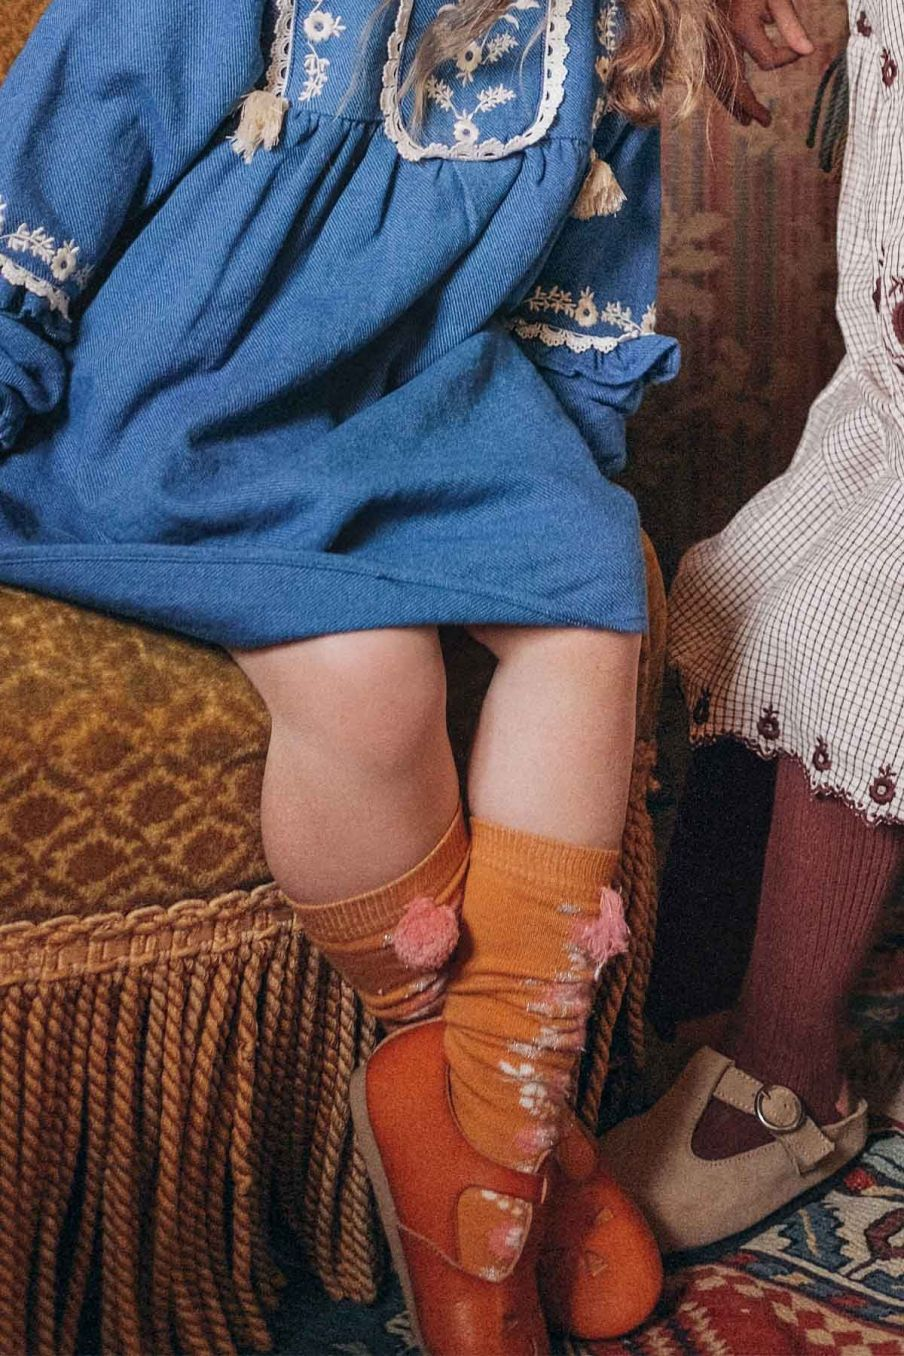 chaussettes fille chelie mustard - louise misha